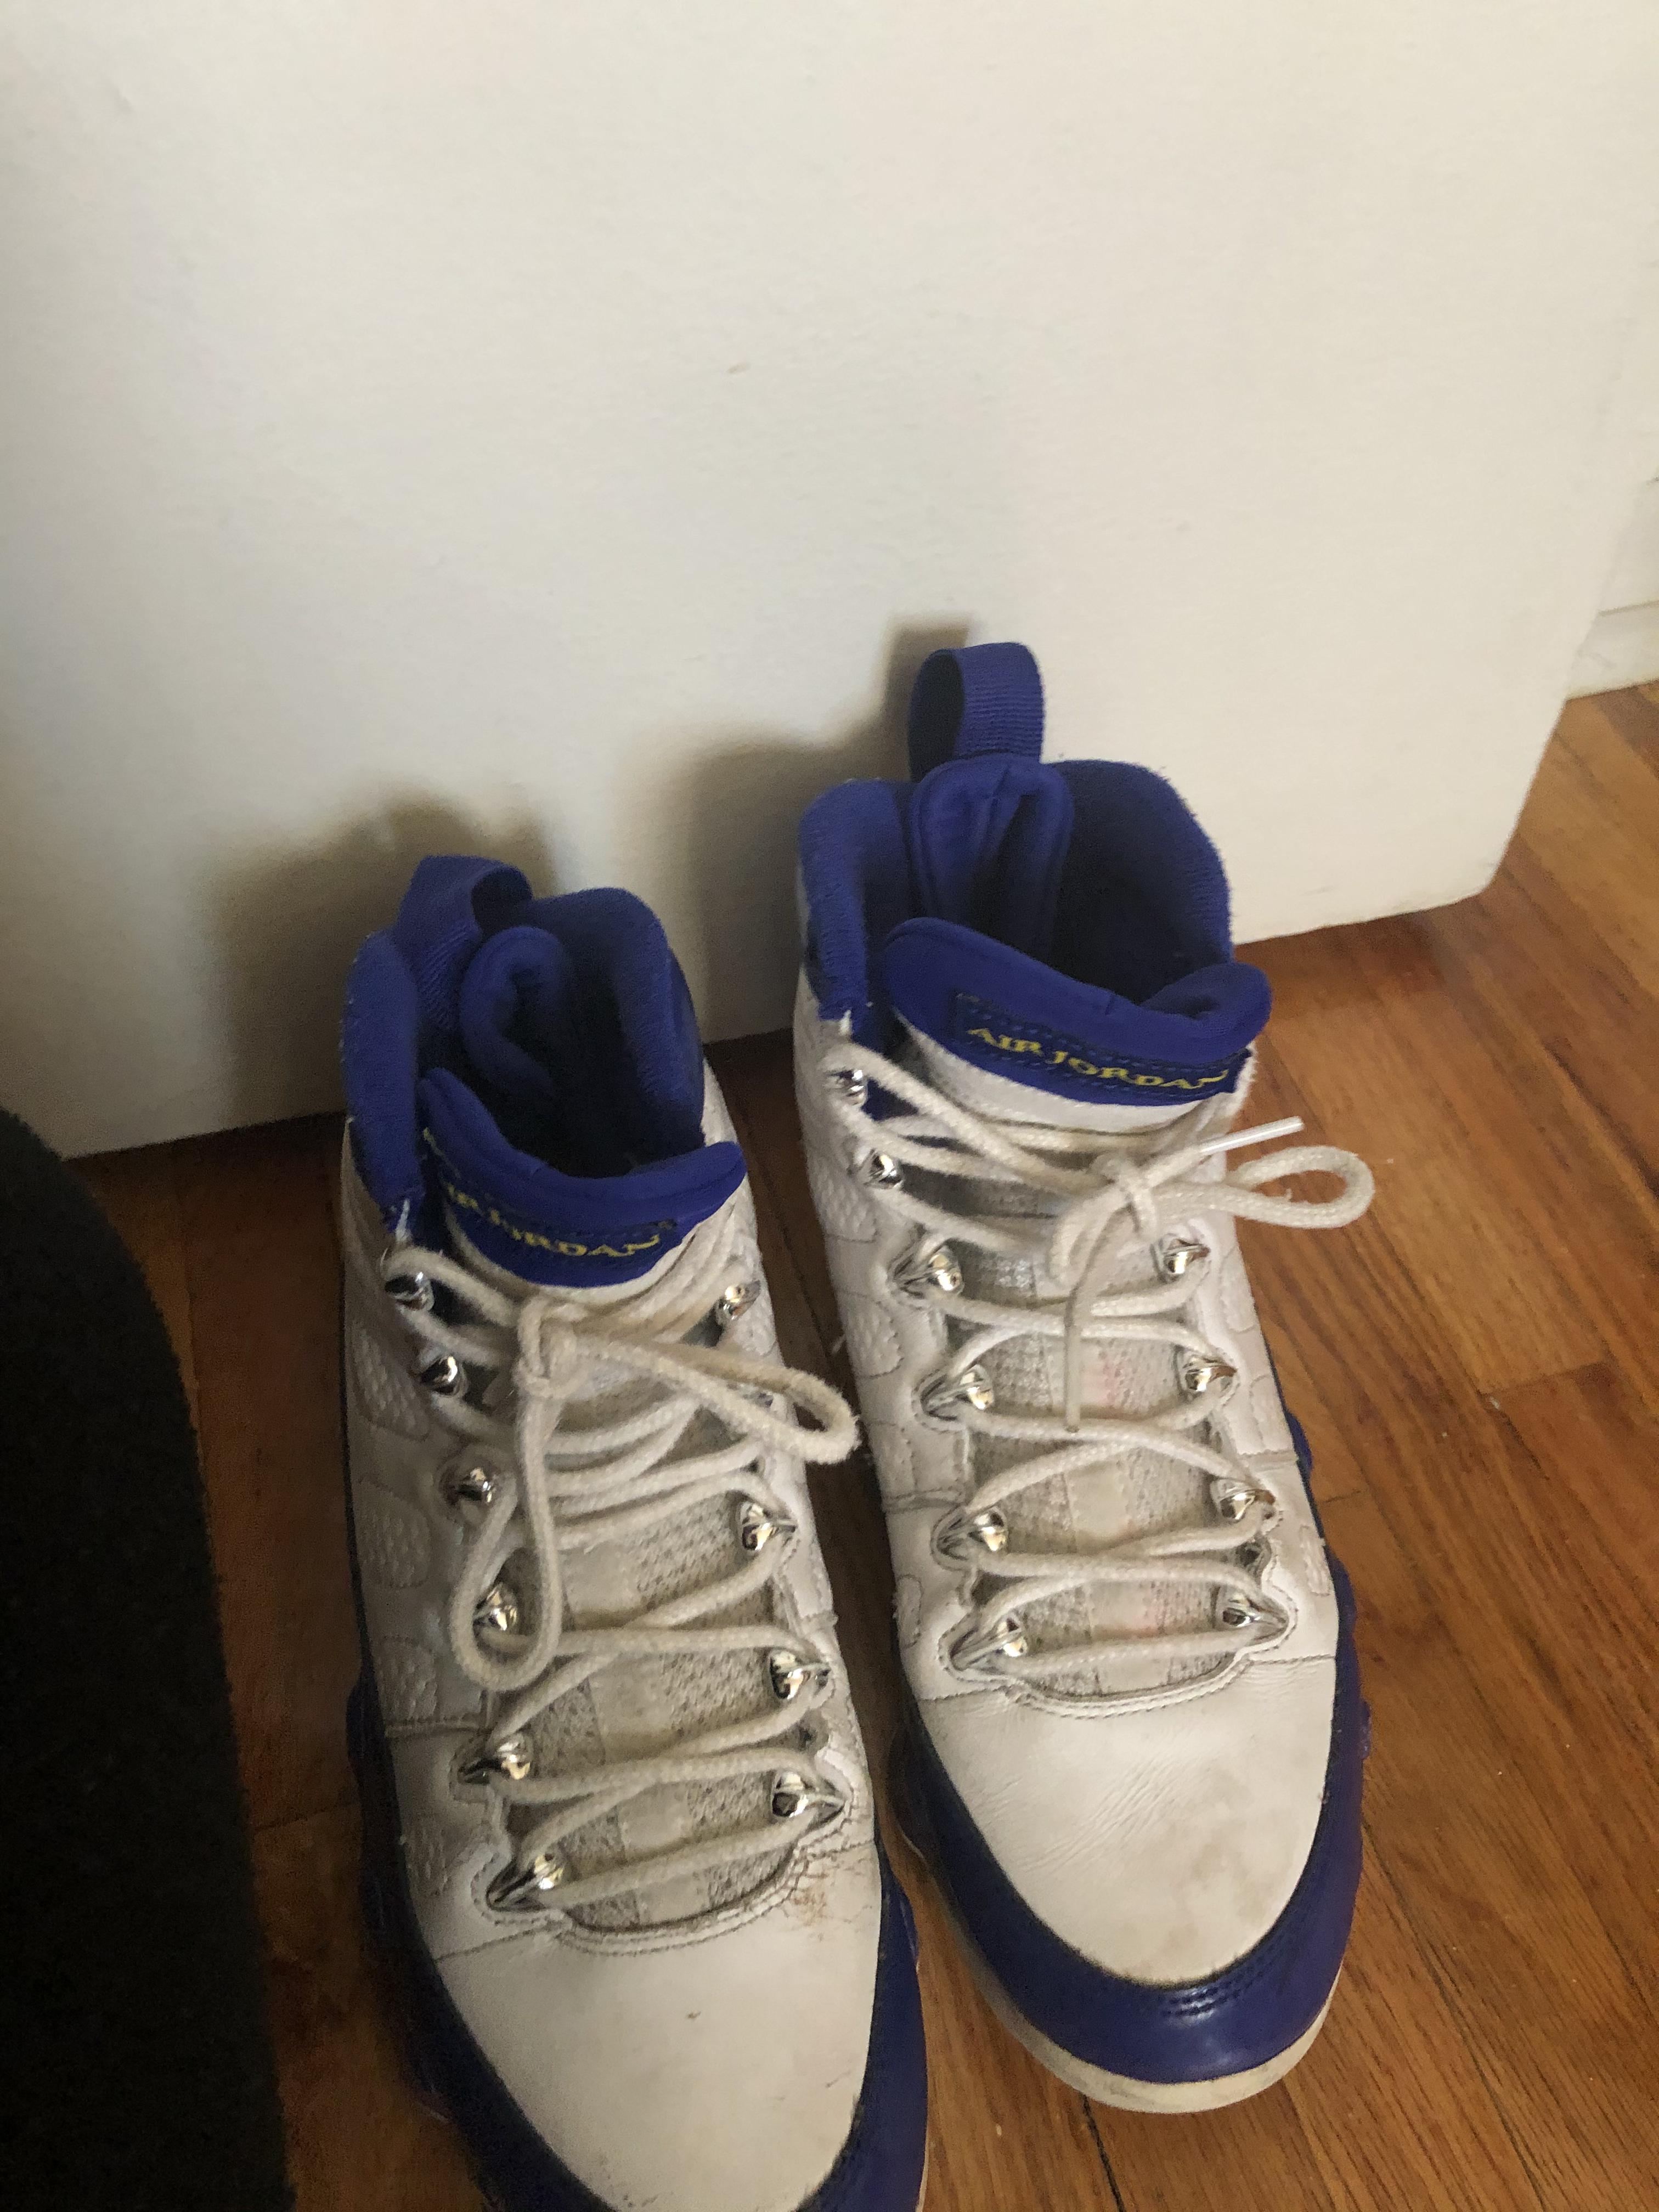 Air Jordan - $110 - Size 0